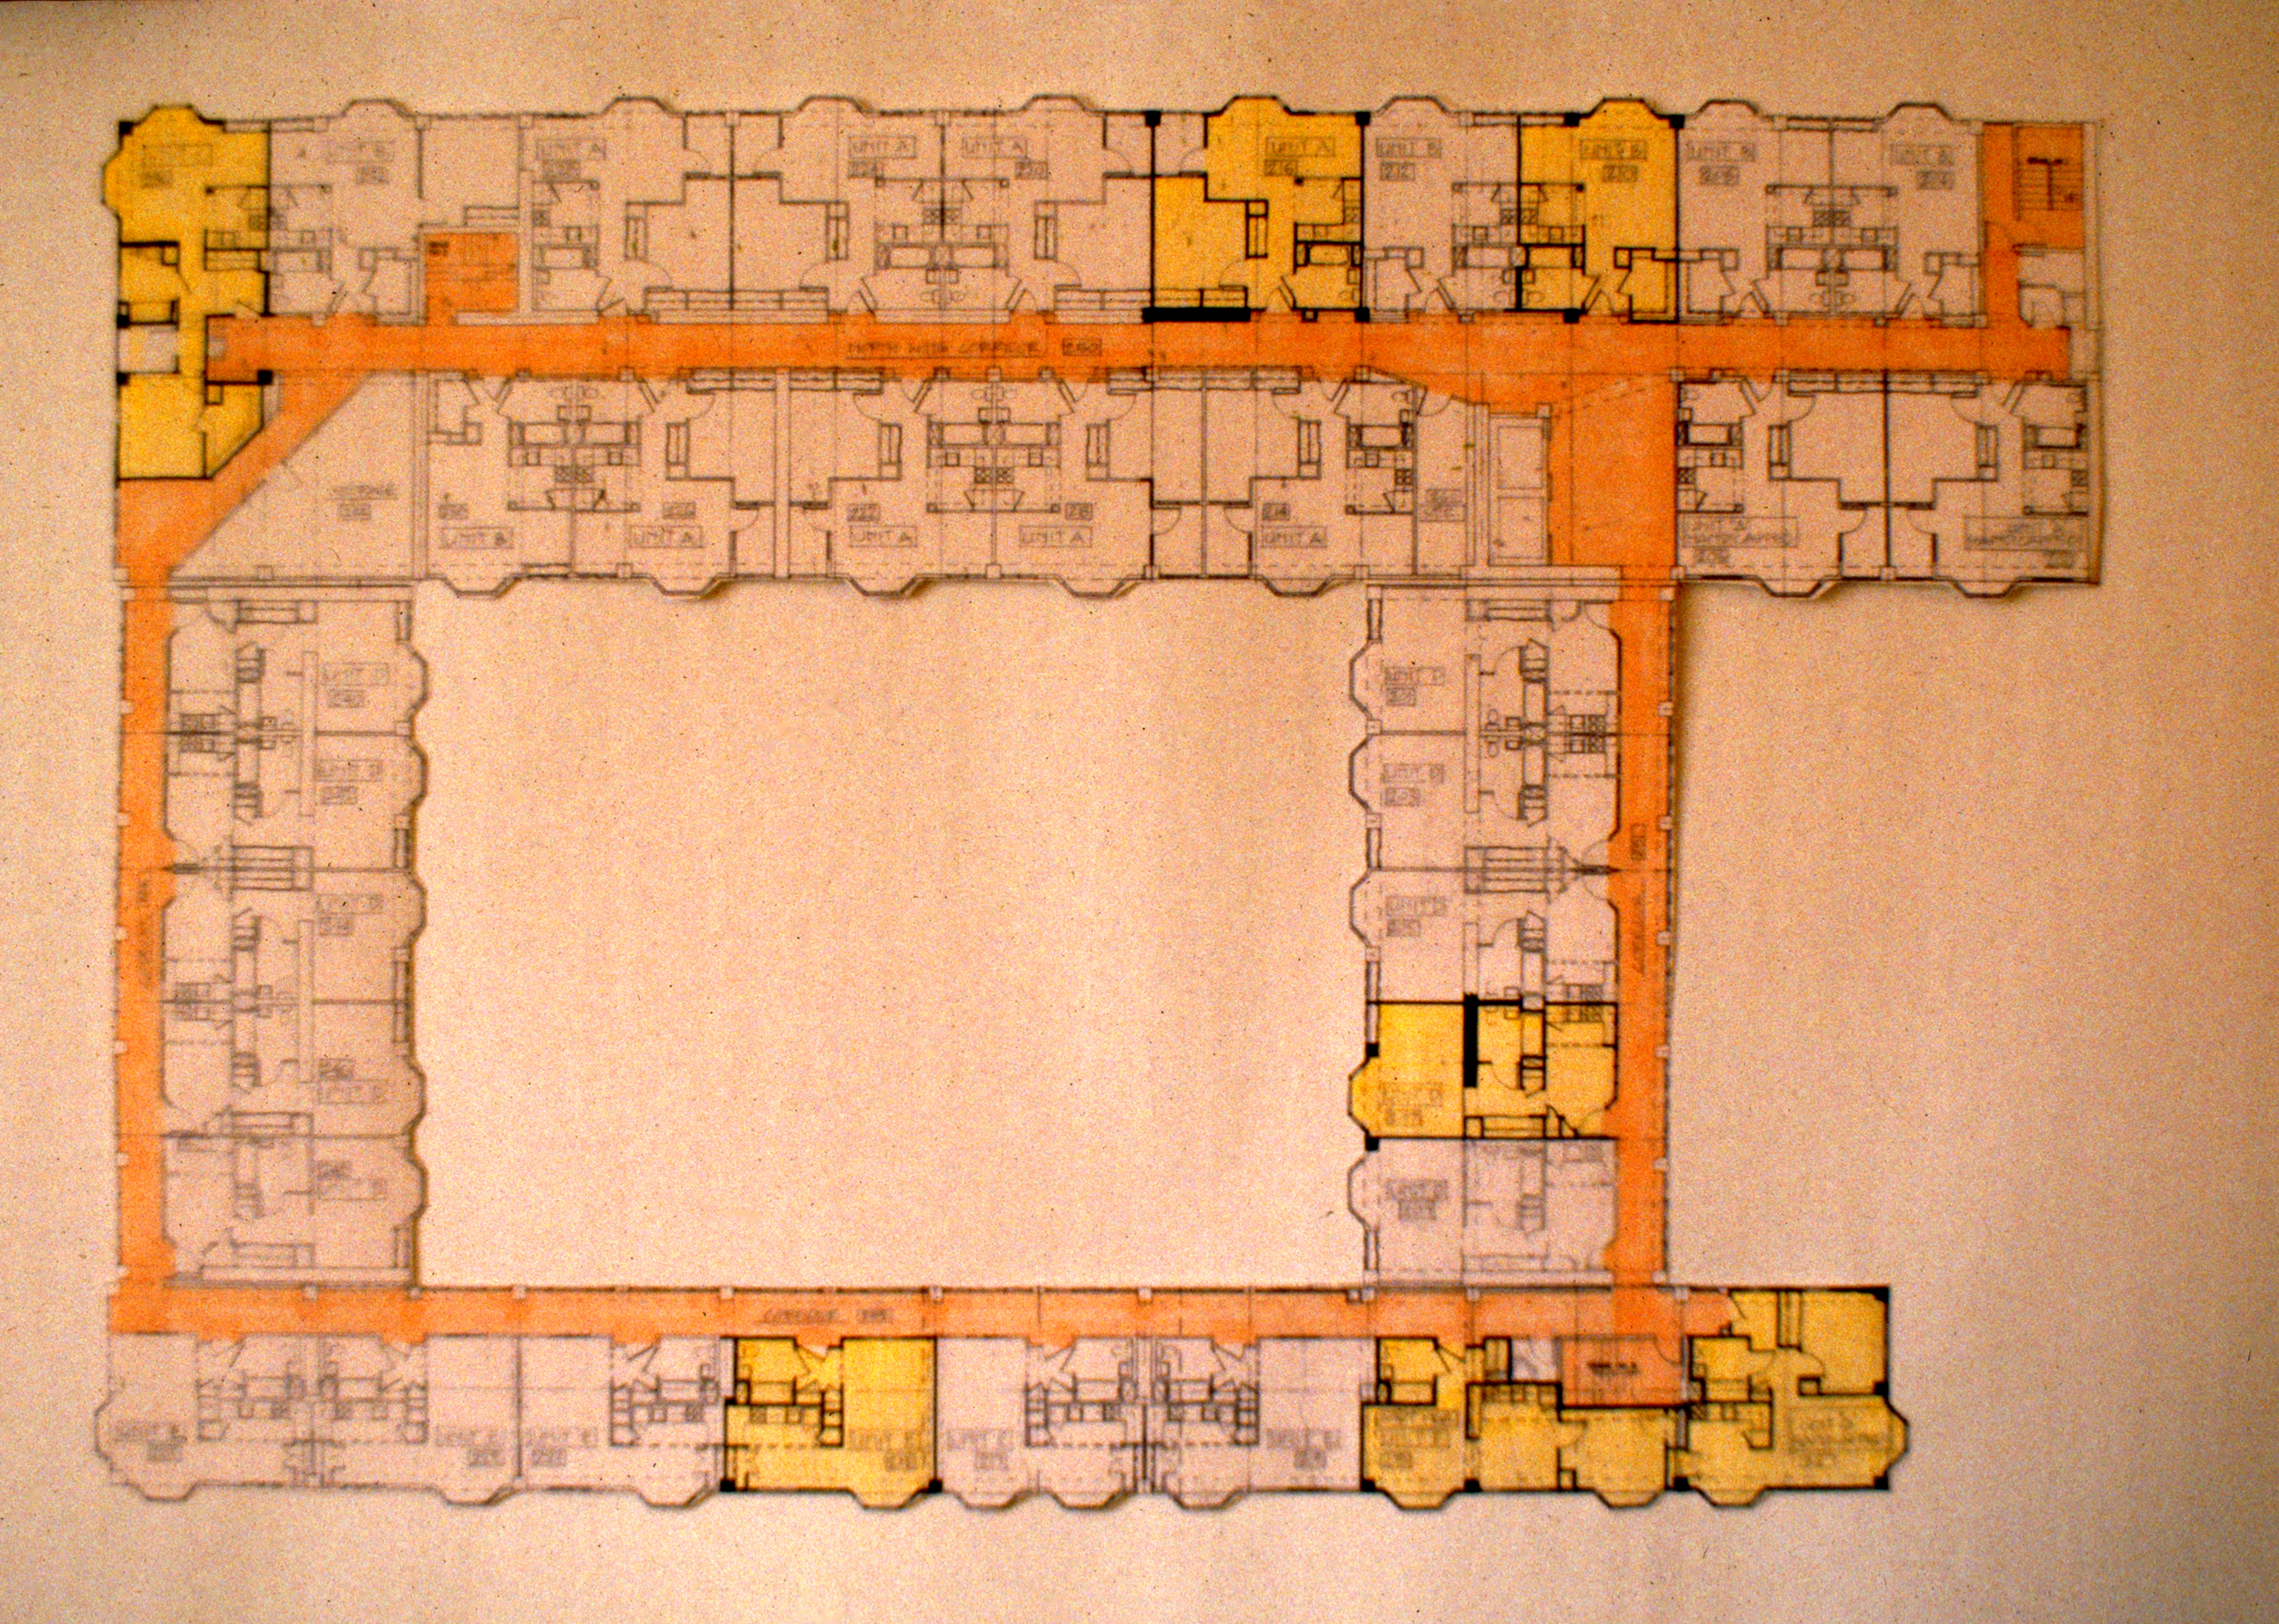 3rd fllor plan.jpg